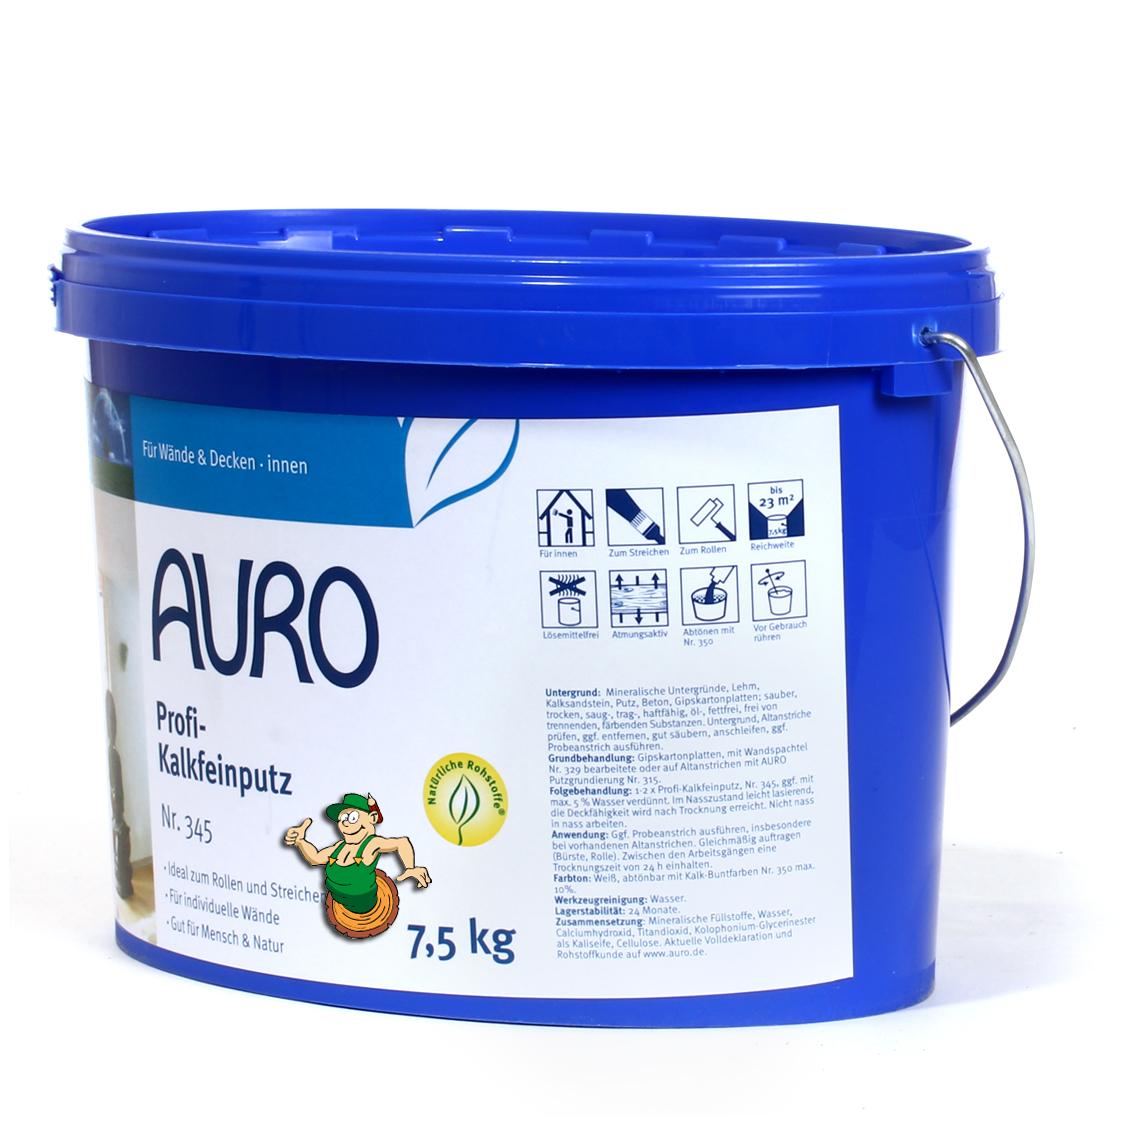 Auro profi kalkfeinputz nr 345 auro shop - Keller wandfarbe atmungsaktiv ...